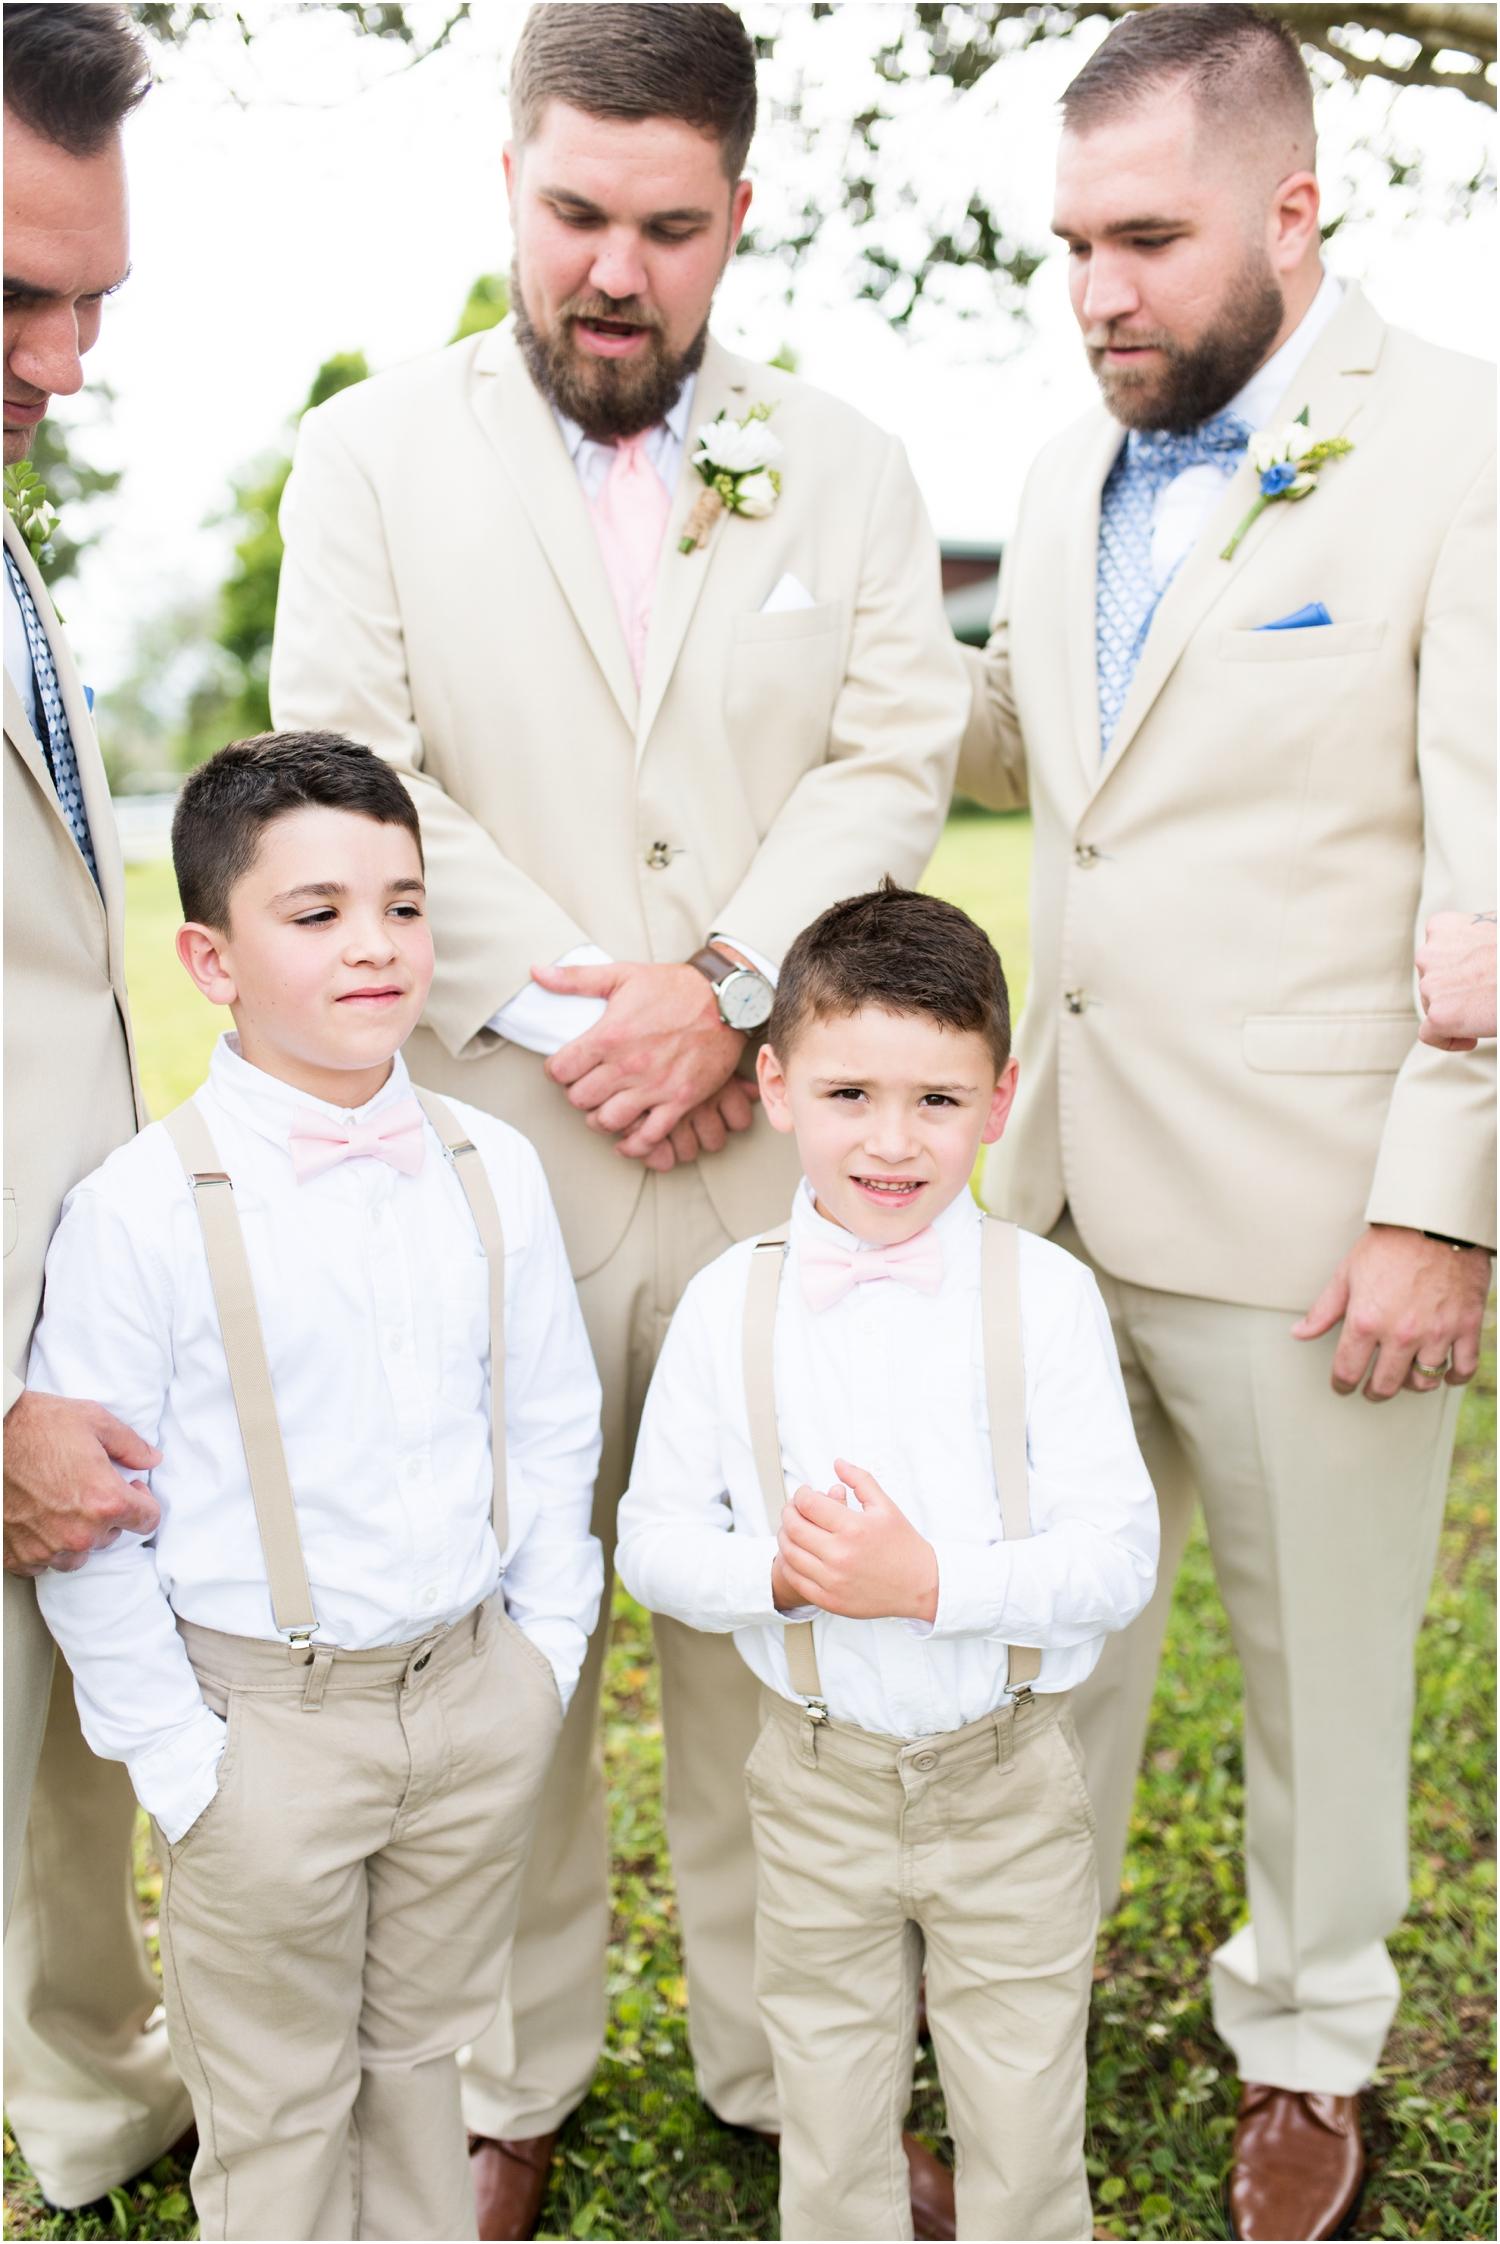 Sowell Farms Milton Florida Rustic Woodsy Barn Wedding Photographer groom groomsmen